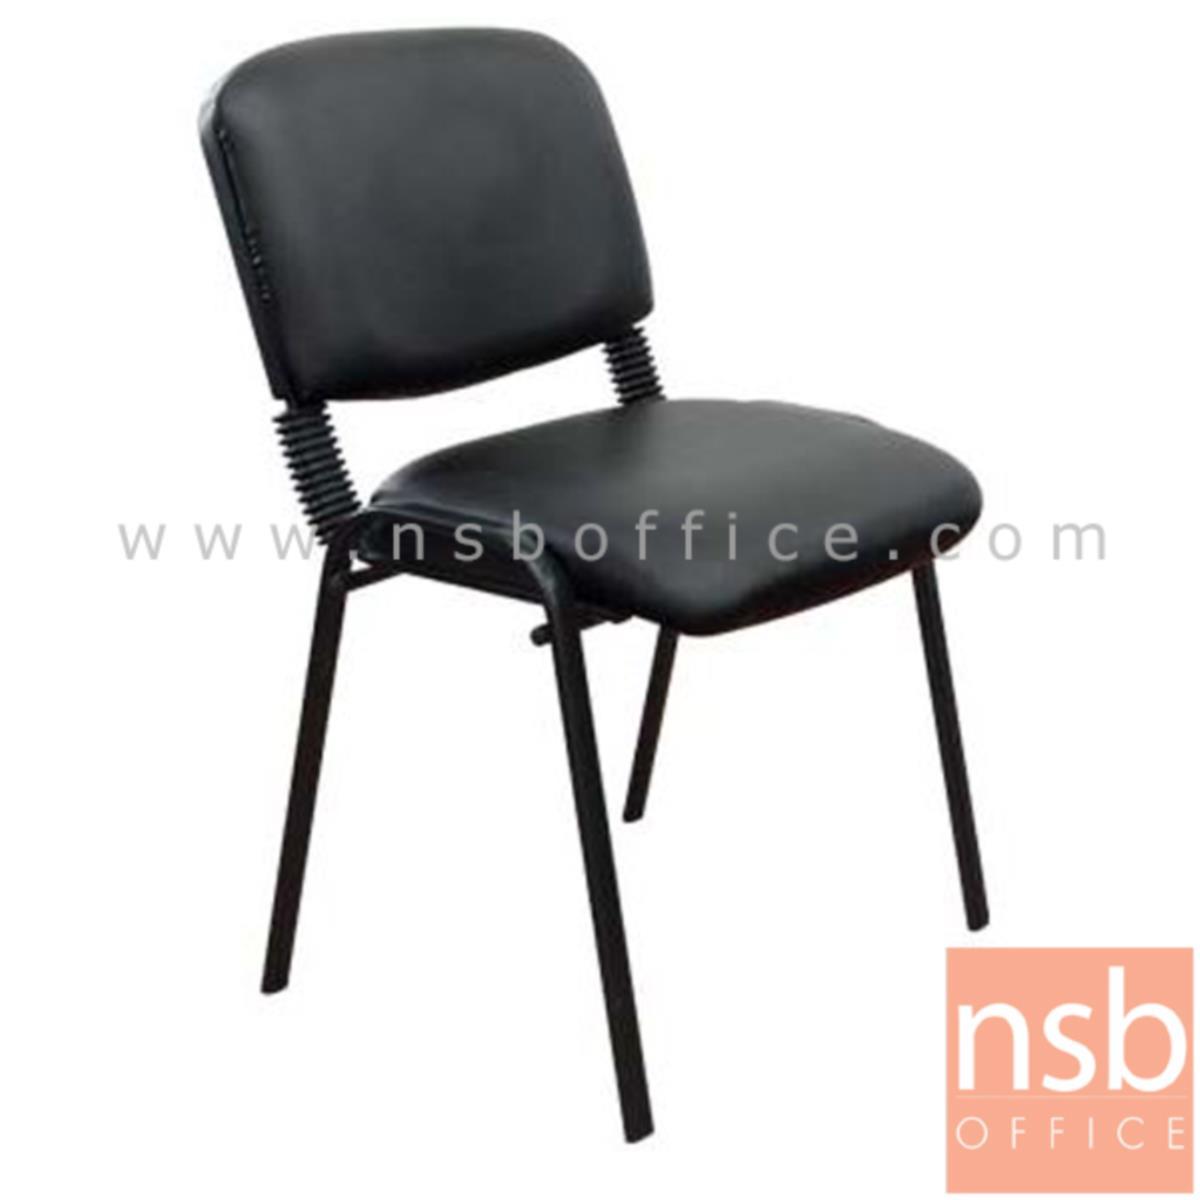 B04A141:เก้าอี้รับแขก รุ่น Blackgray  ขาเหล็กพ่นดำ